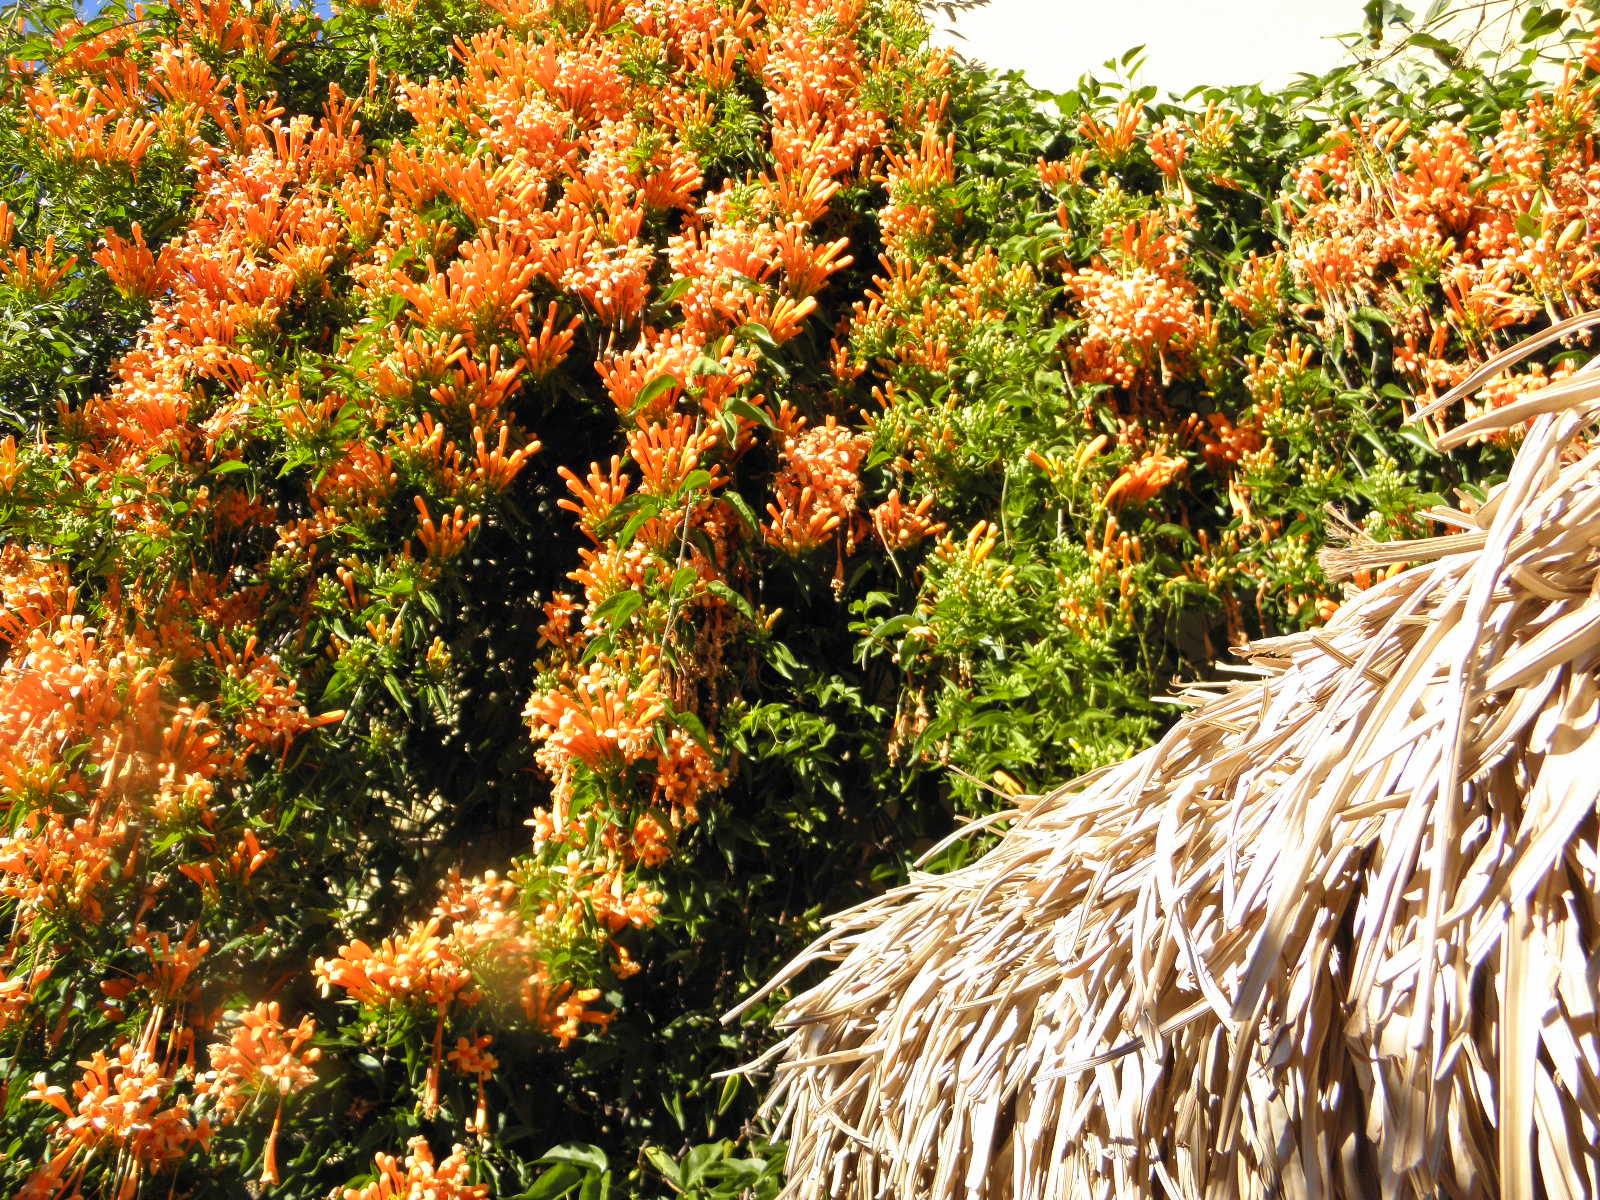 blanket of orange flowers, with straw gazebo underneath